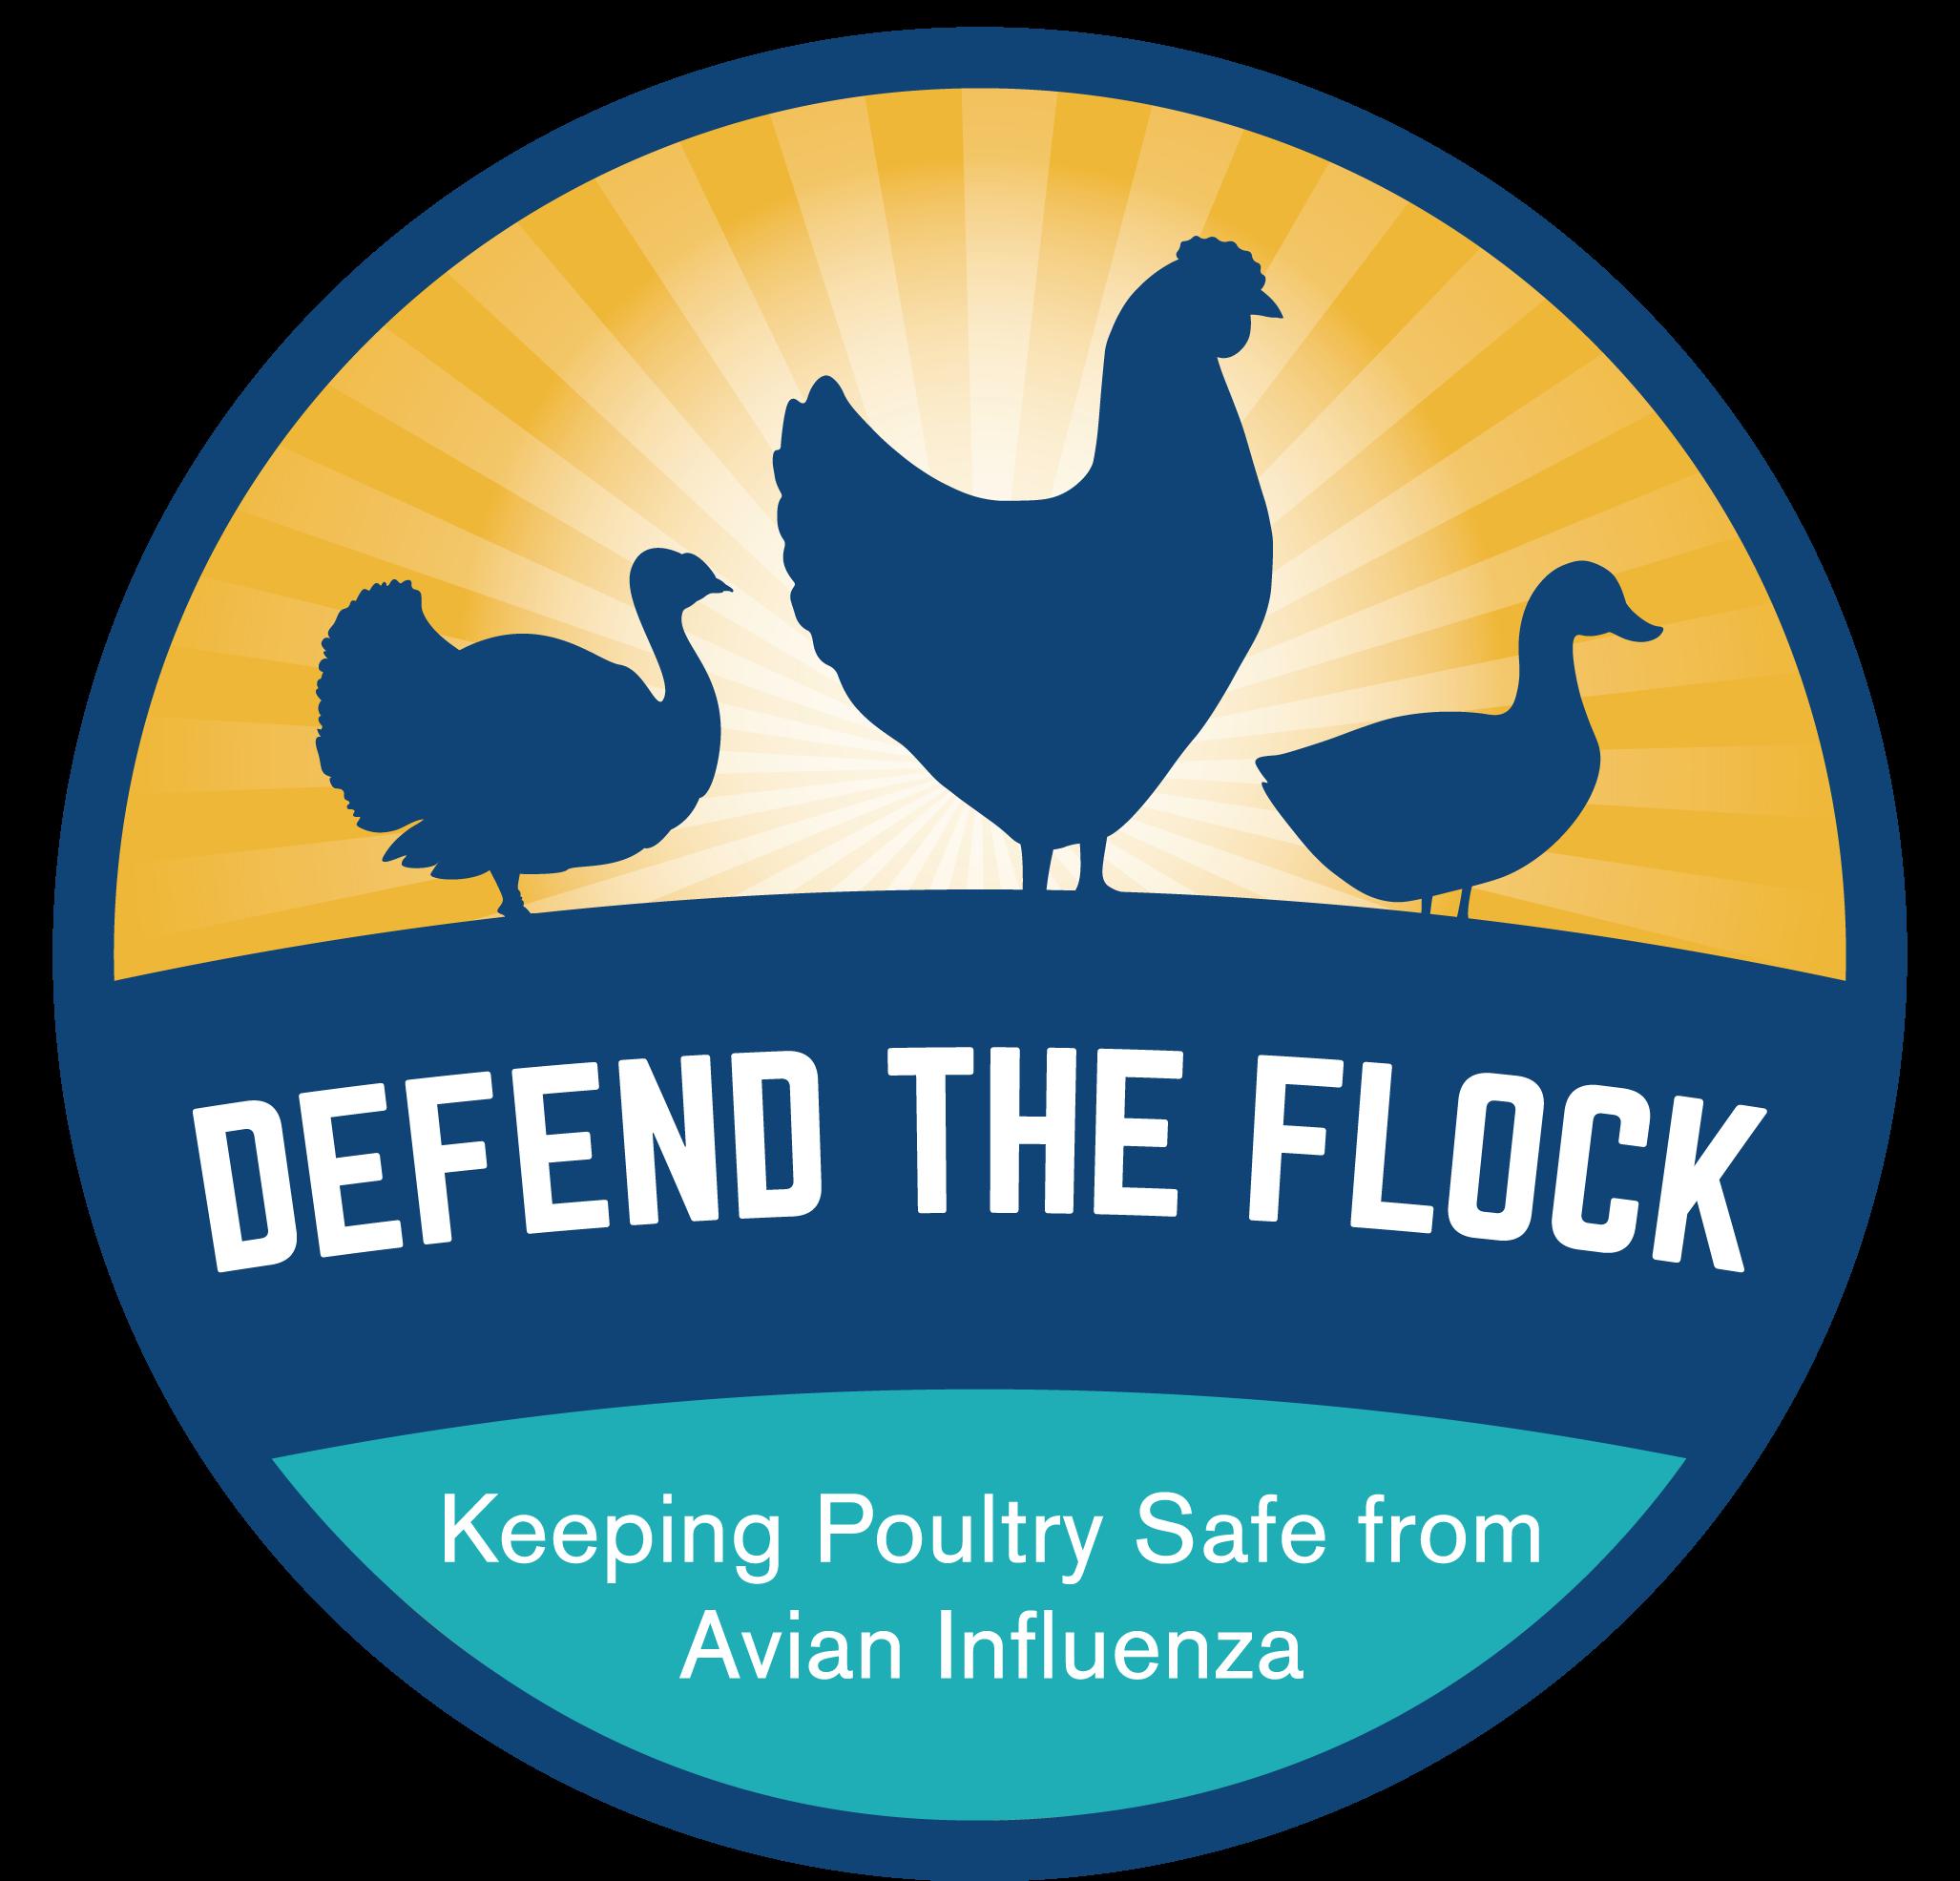 defend-the-flock-logo-generic.png